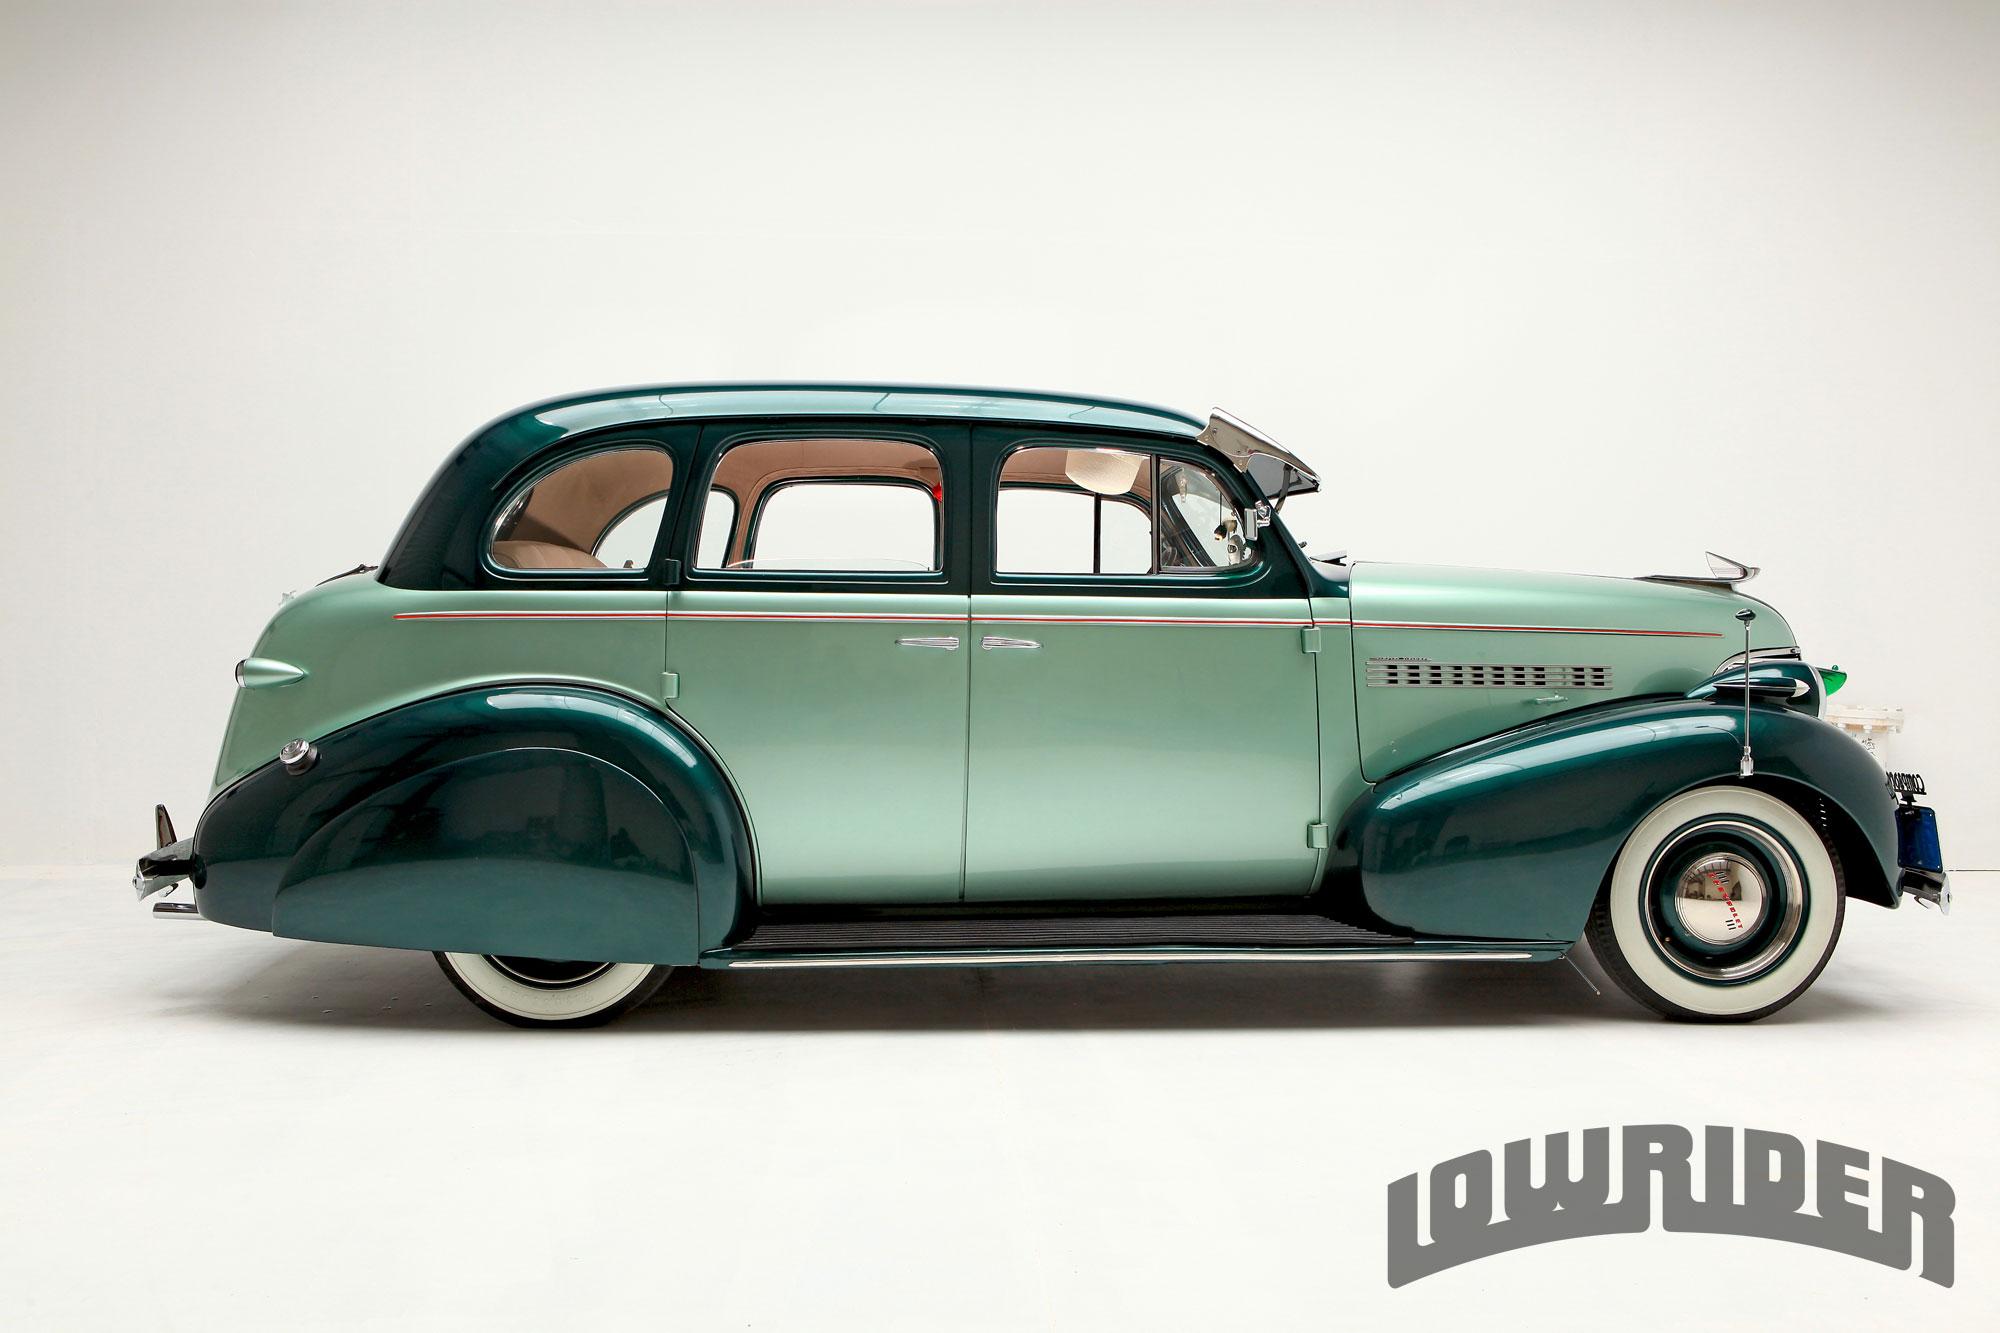 ac8f78098bb06 1939 Chevrolet Master Deluxe - Lowrider Magazine